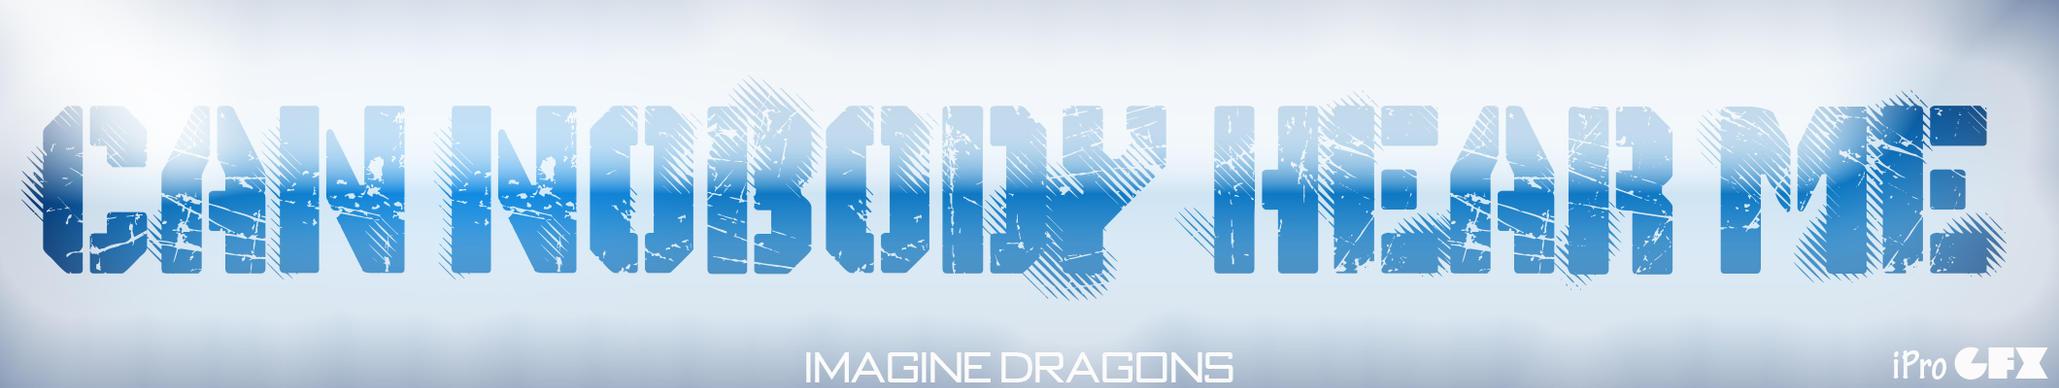 #imaginedragonsfanart | Explore imaginedragonsfanart on ...